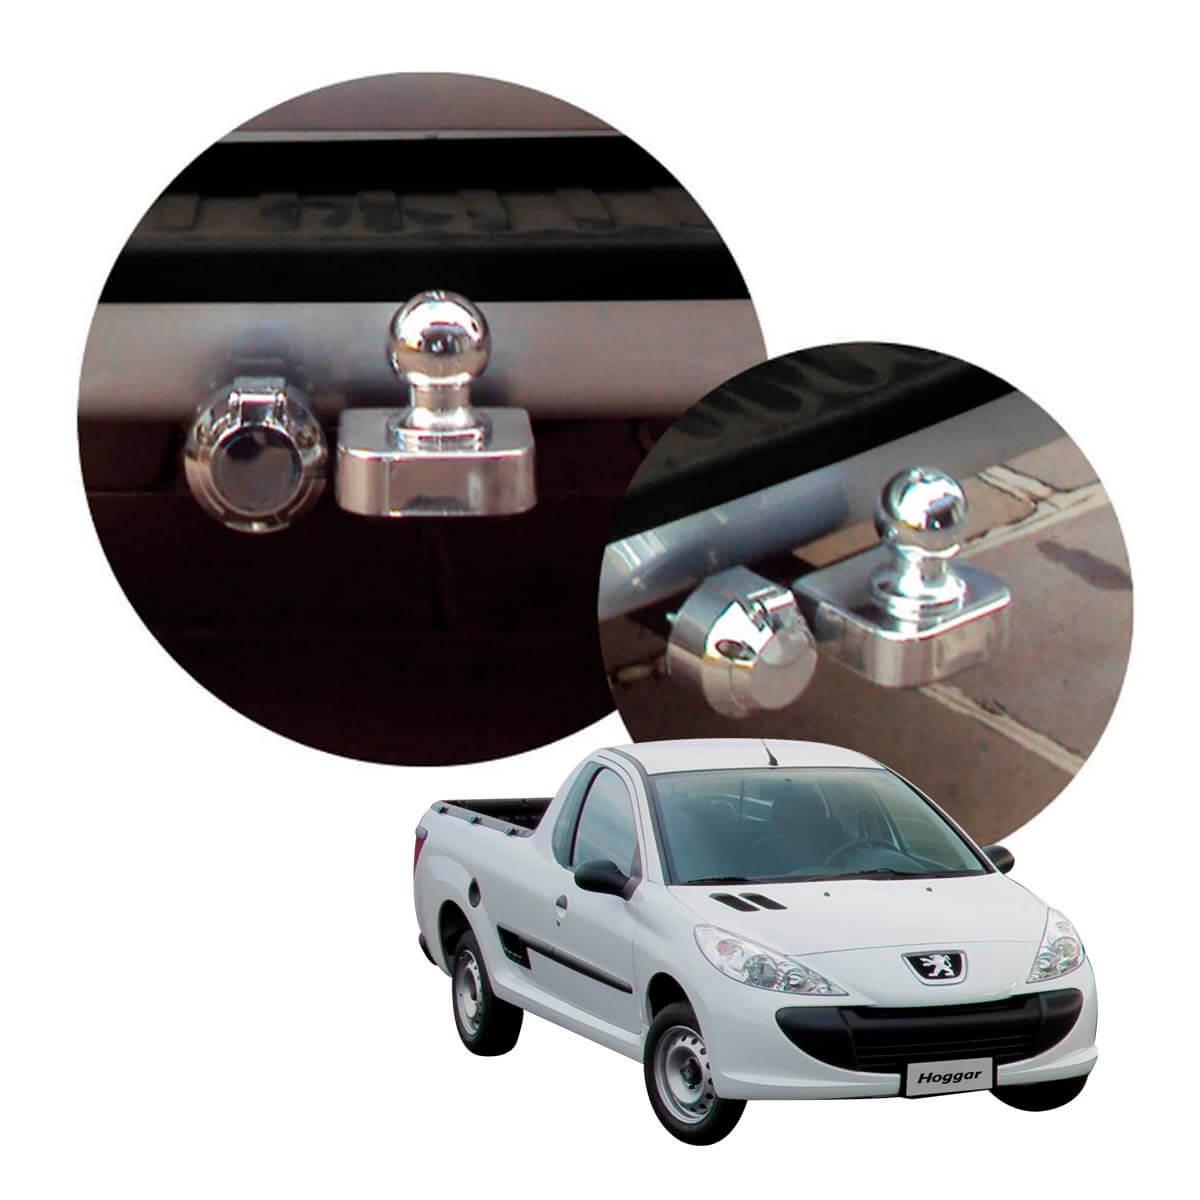 Engate de reboque fixo Peugeot Hoggar 2010 a 2014